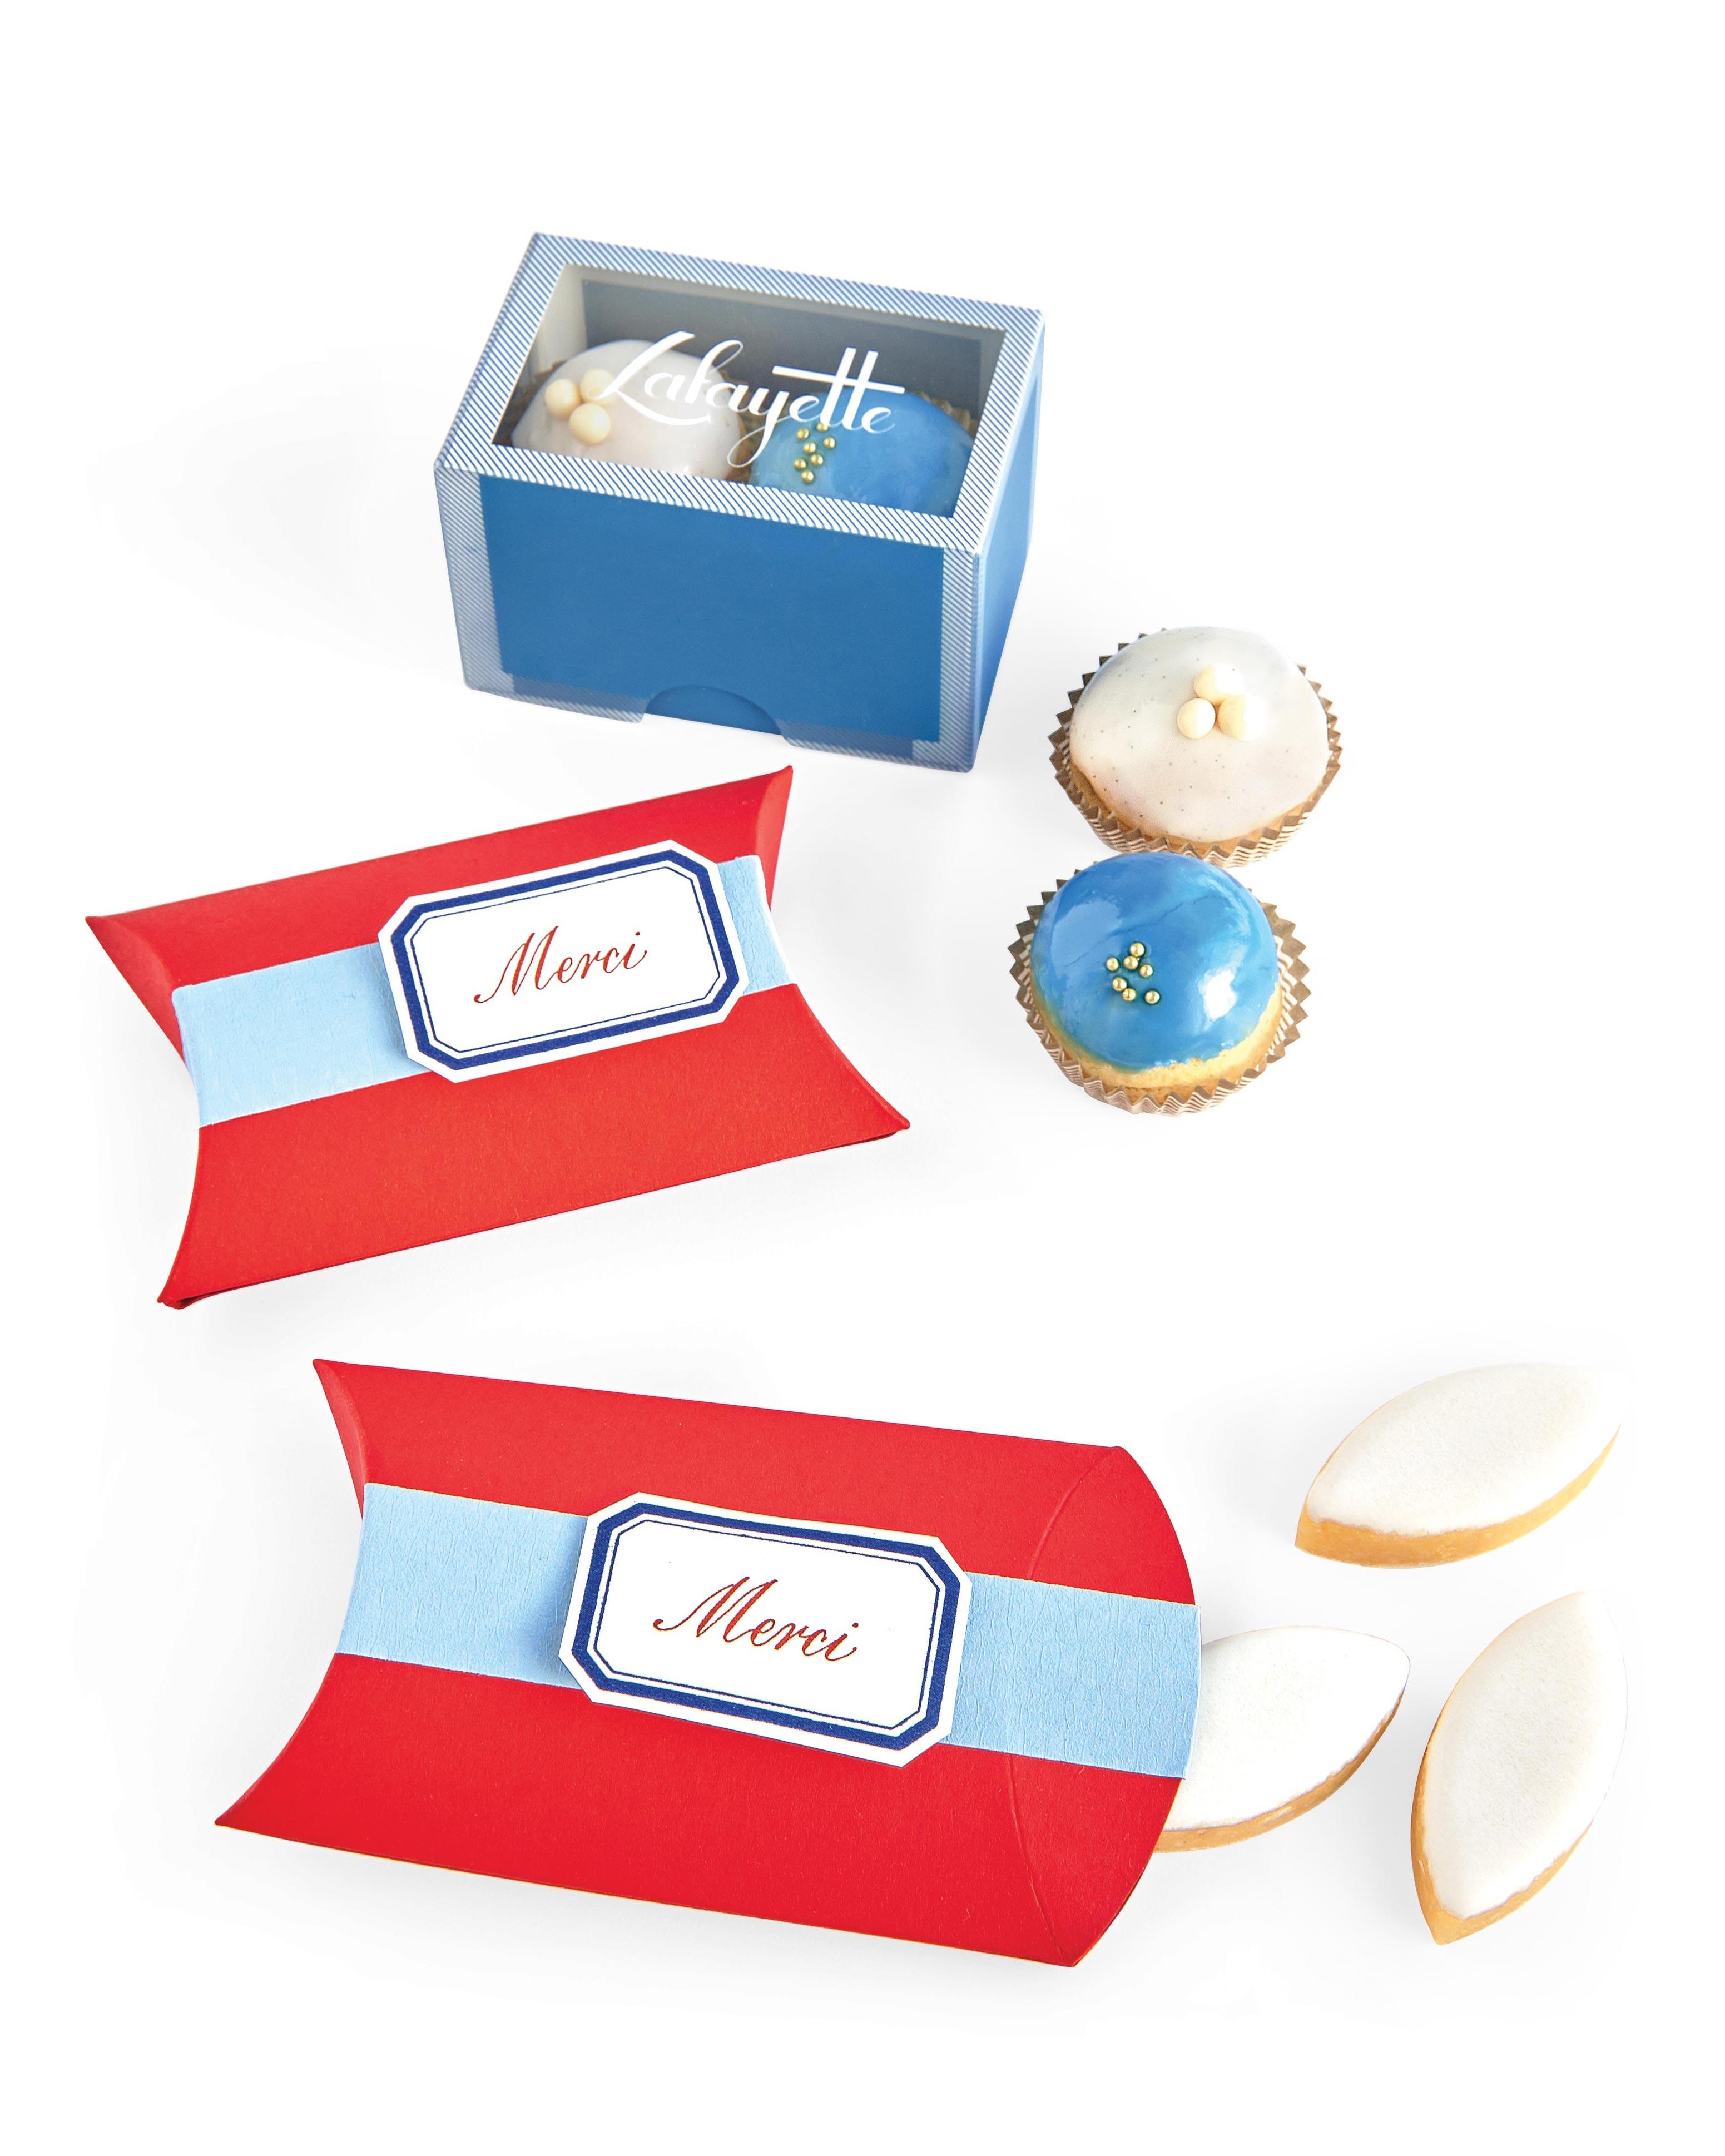 blue-red-color-palette-cookies-839-d112667.jpg